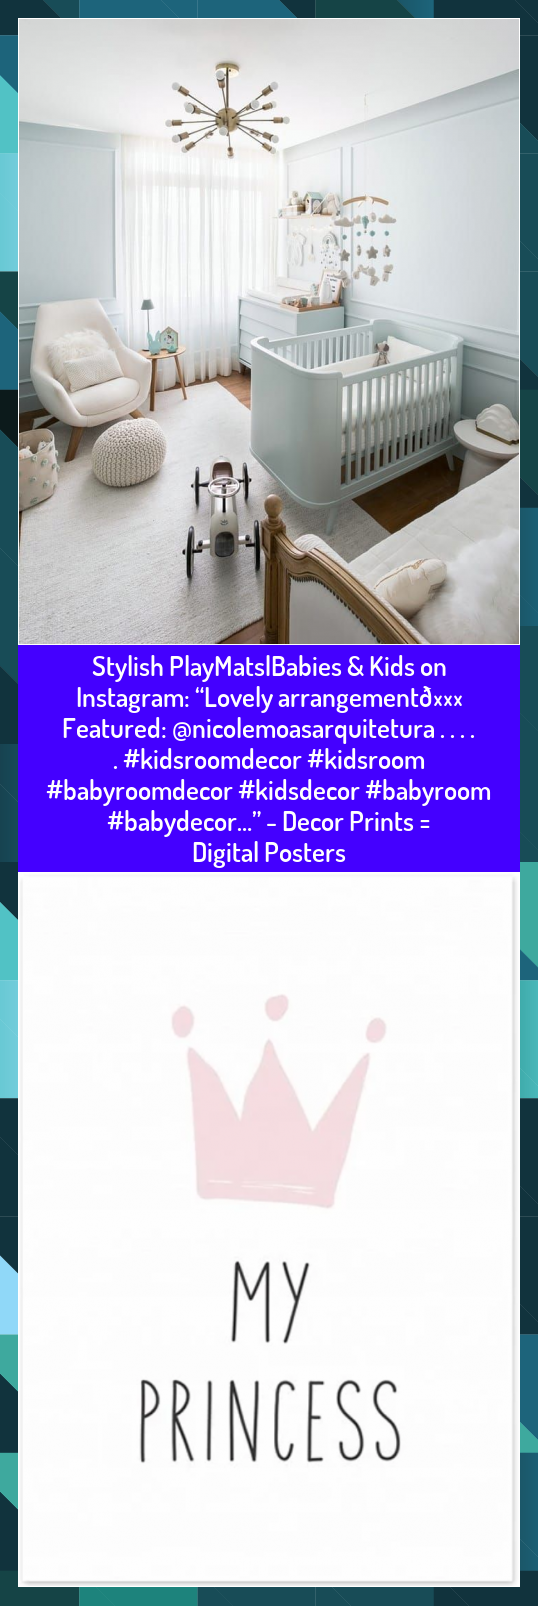 "Stylish PlayMats|Babies & Kids on Instagram: ""Lovely arrangement💖 Featured: @nicolemoasarquitetura . . . . . #kidsroomdecor #kidsroom #babyroomdecor #kidsdecor #babyroom #babydecor…"" - Decor Prints = Digital Posters #arrangement #babydecor #babyroom #babyroomdecor #Decor #Digital #Featured #Instagram #Kids #kidsdecor #kidsroom #kidsroomdecor #LOVELY #nicolemoasarquitetura #PlayMatsBabies #posters #Prints #stylish"